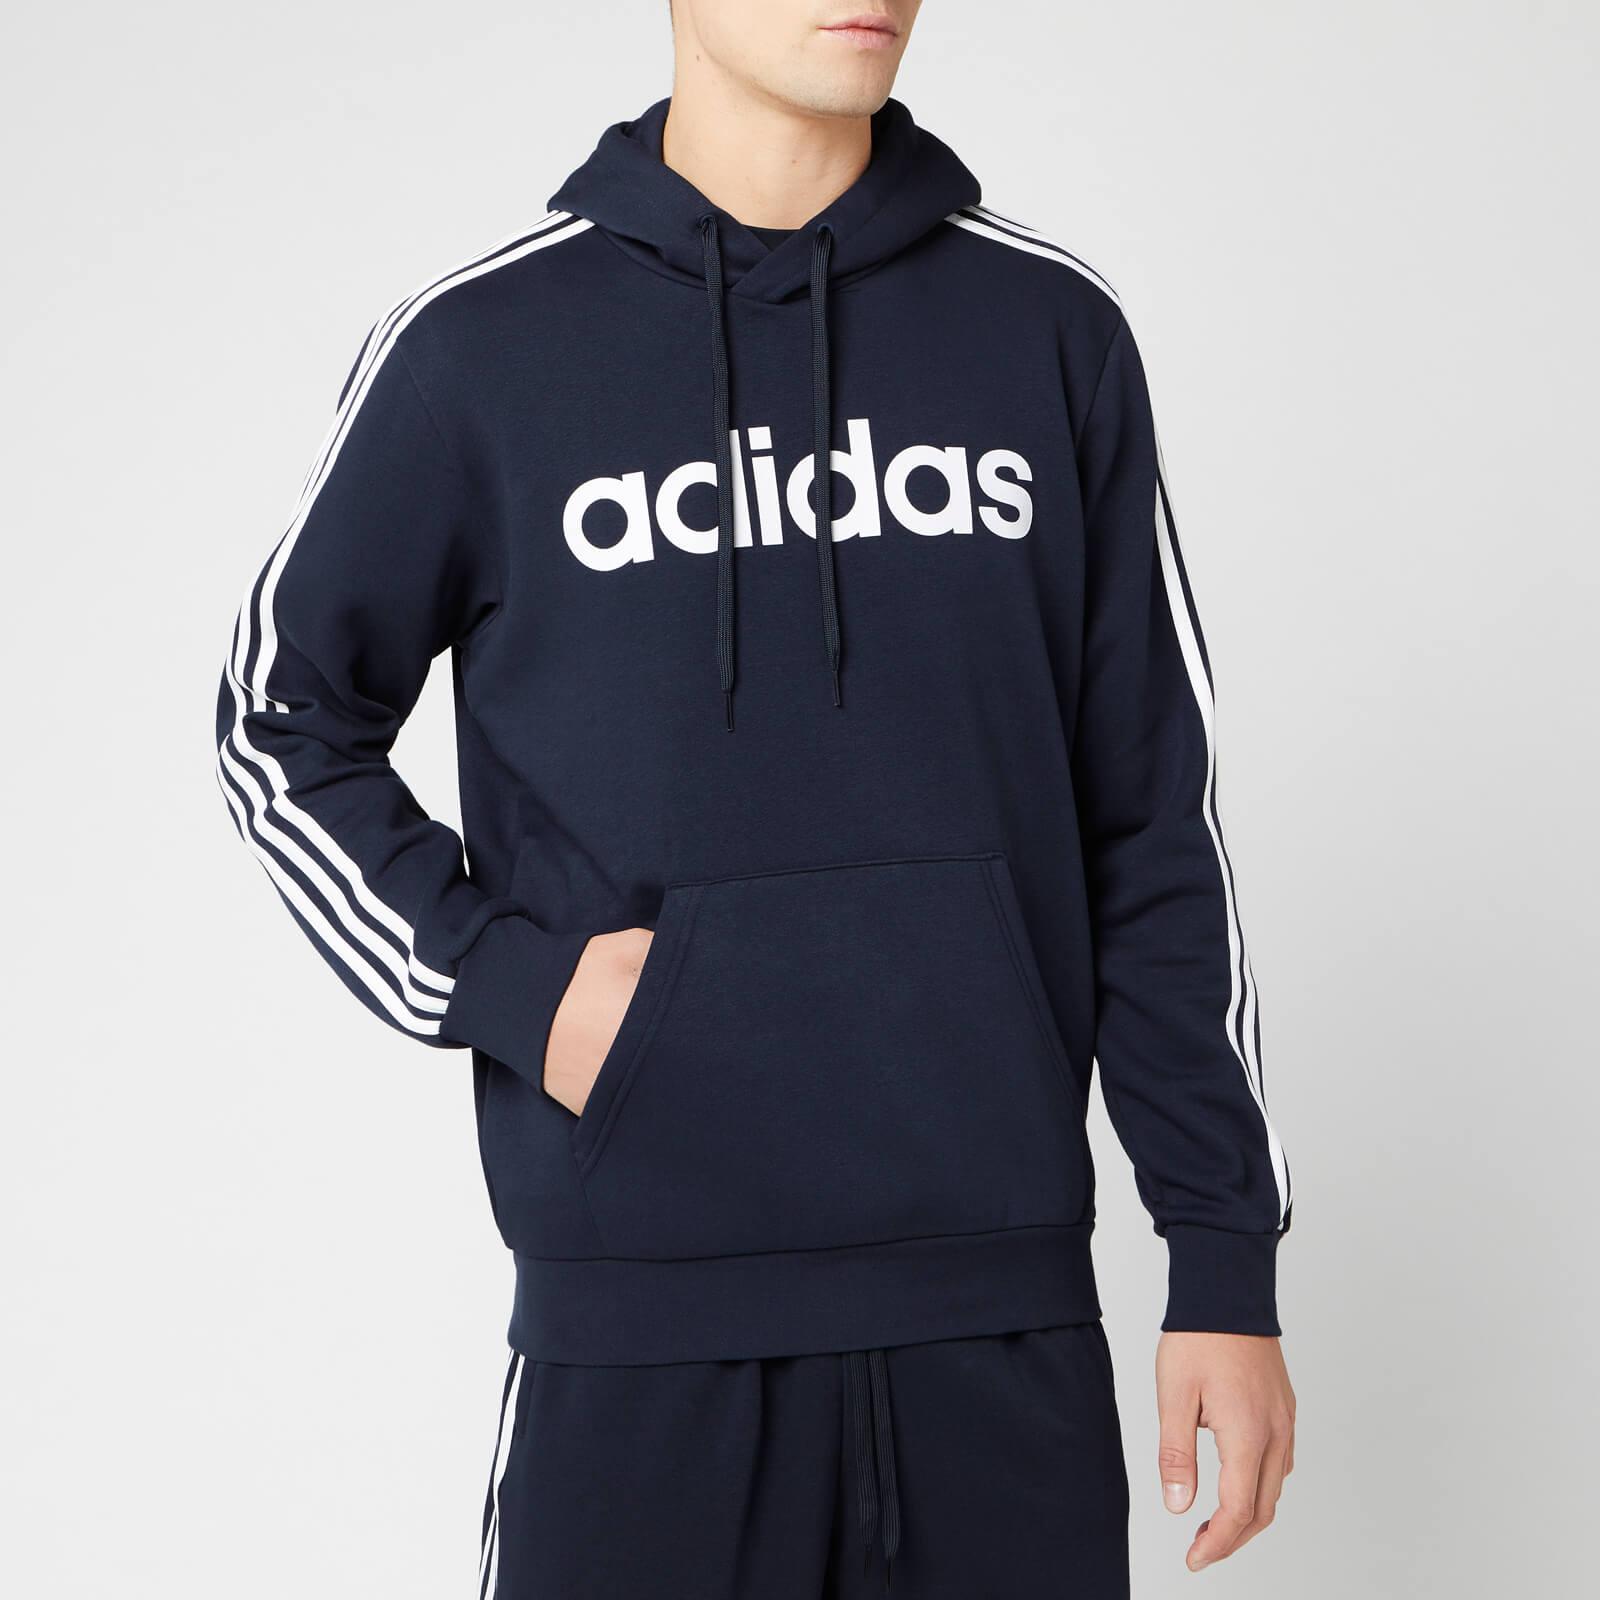 reputable site b2216 c86ef adidas Men's Essential 3 Stripe Pullover Hoodie - Legend Ink/White